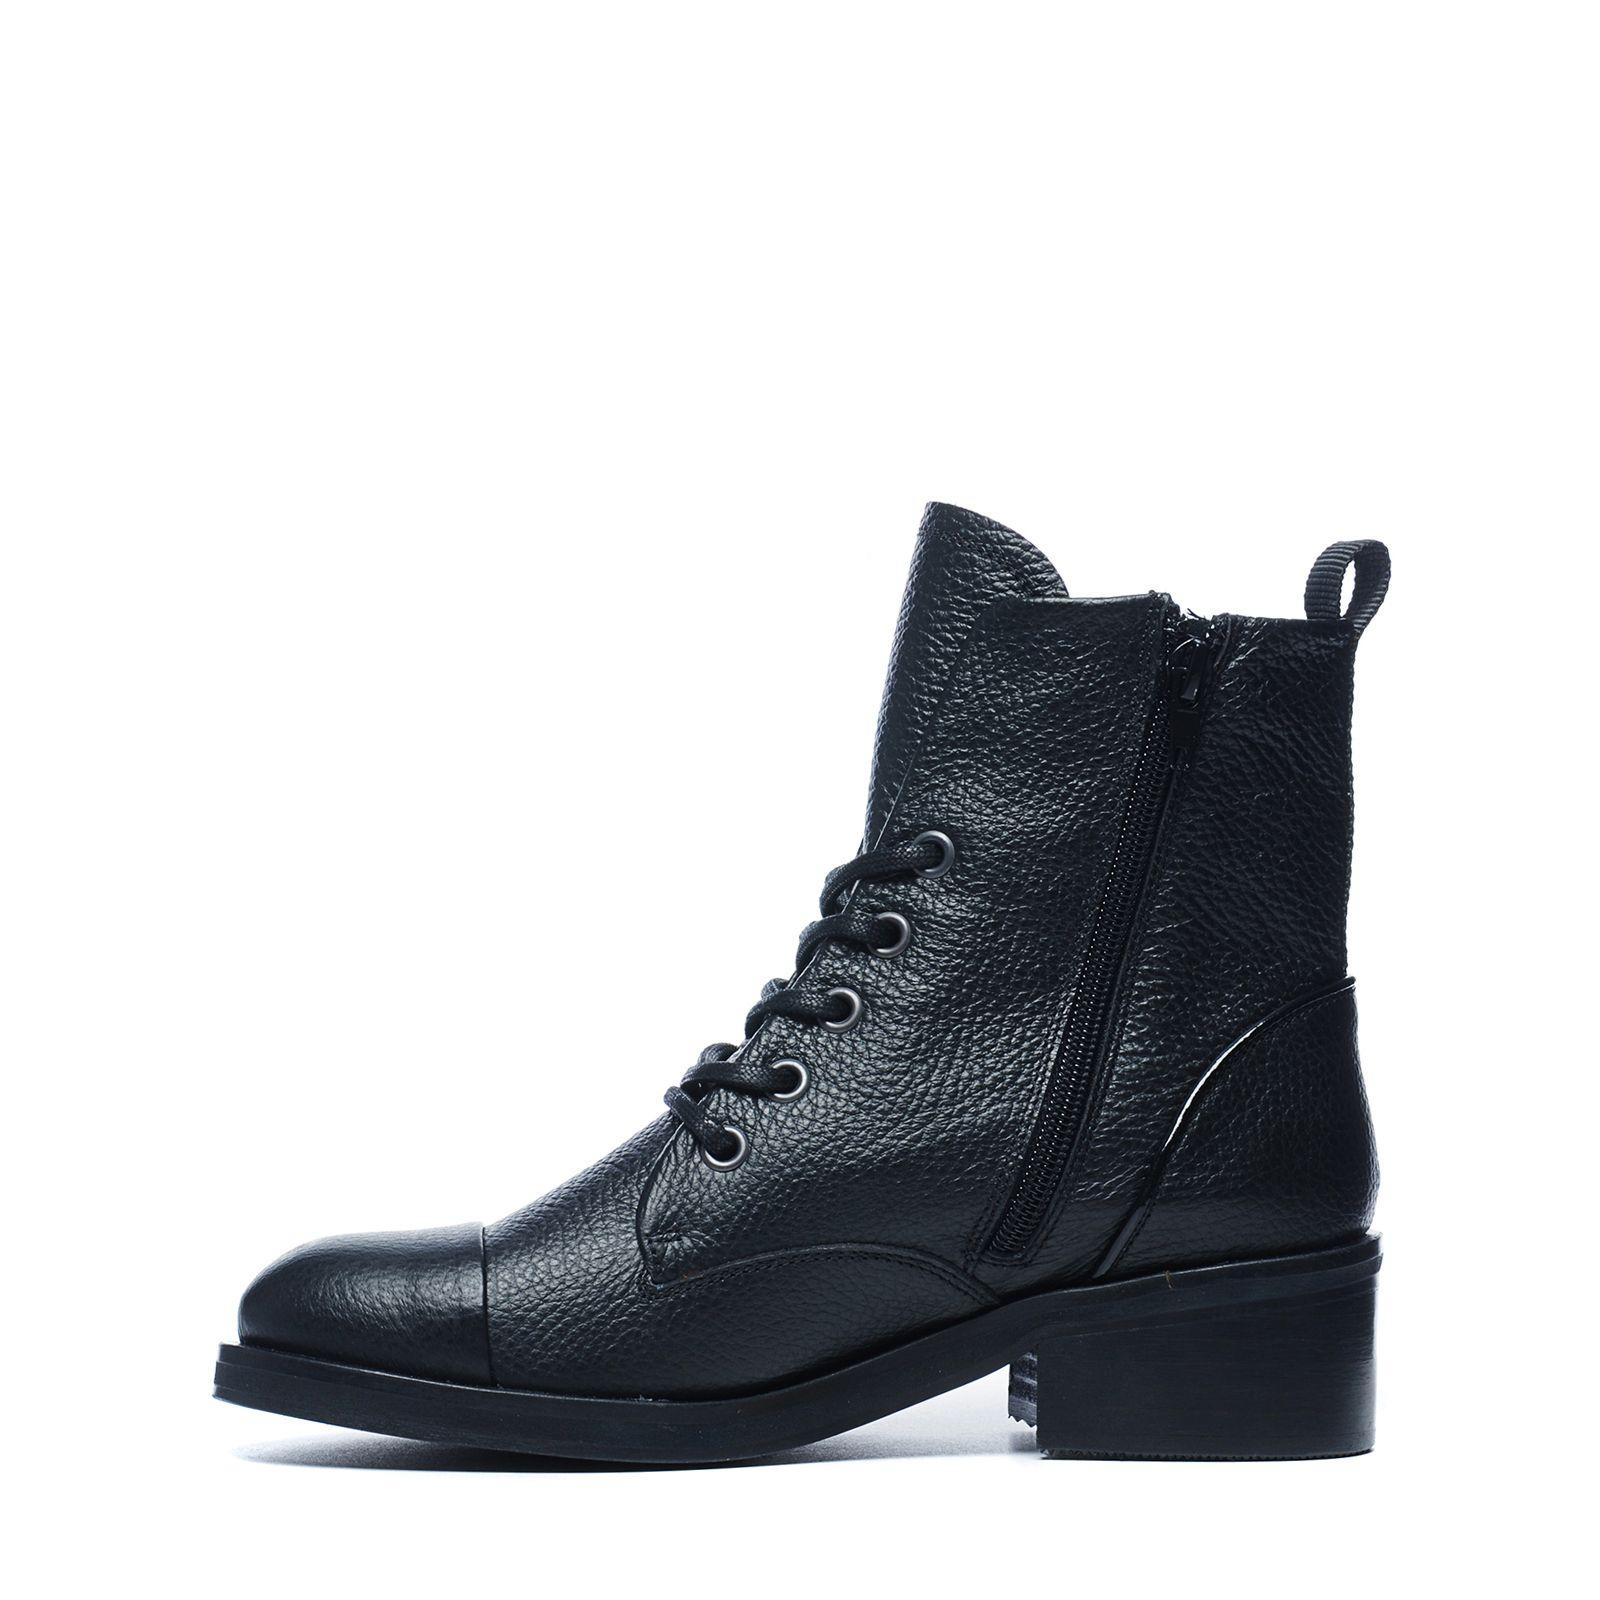 schwarze biker boots mit kleinem absatz. Black Bedroom Furniture Sets. Home Design Ideas